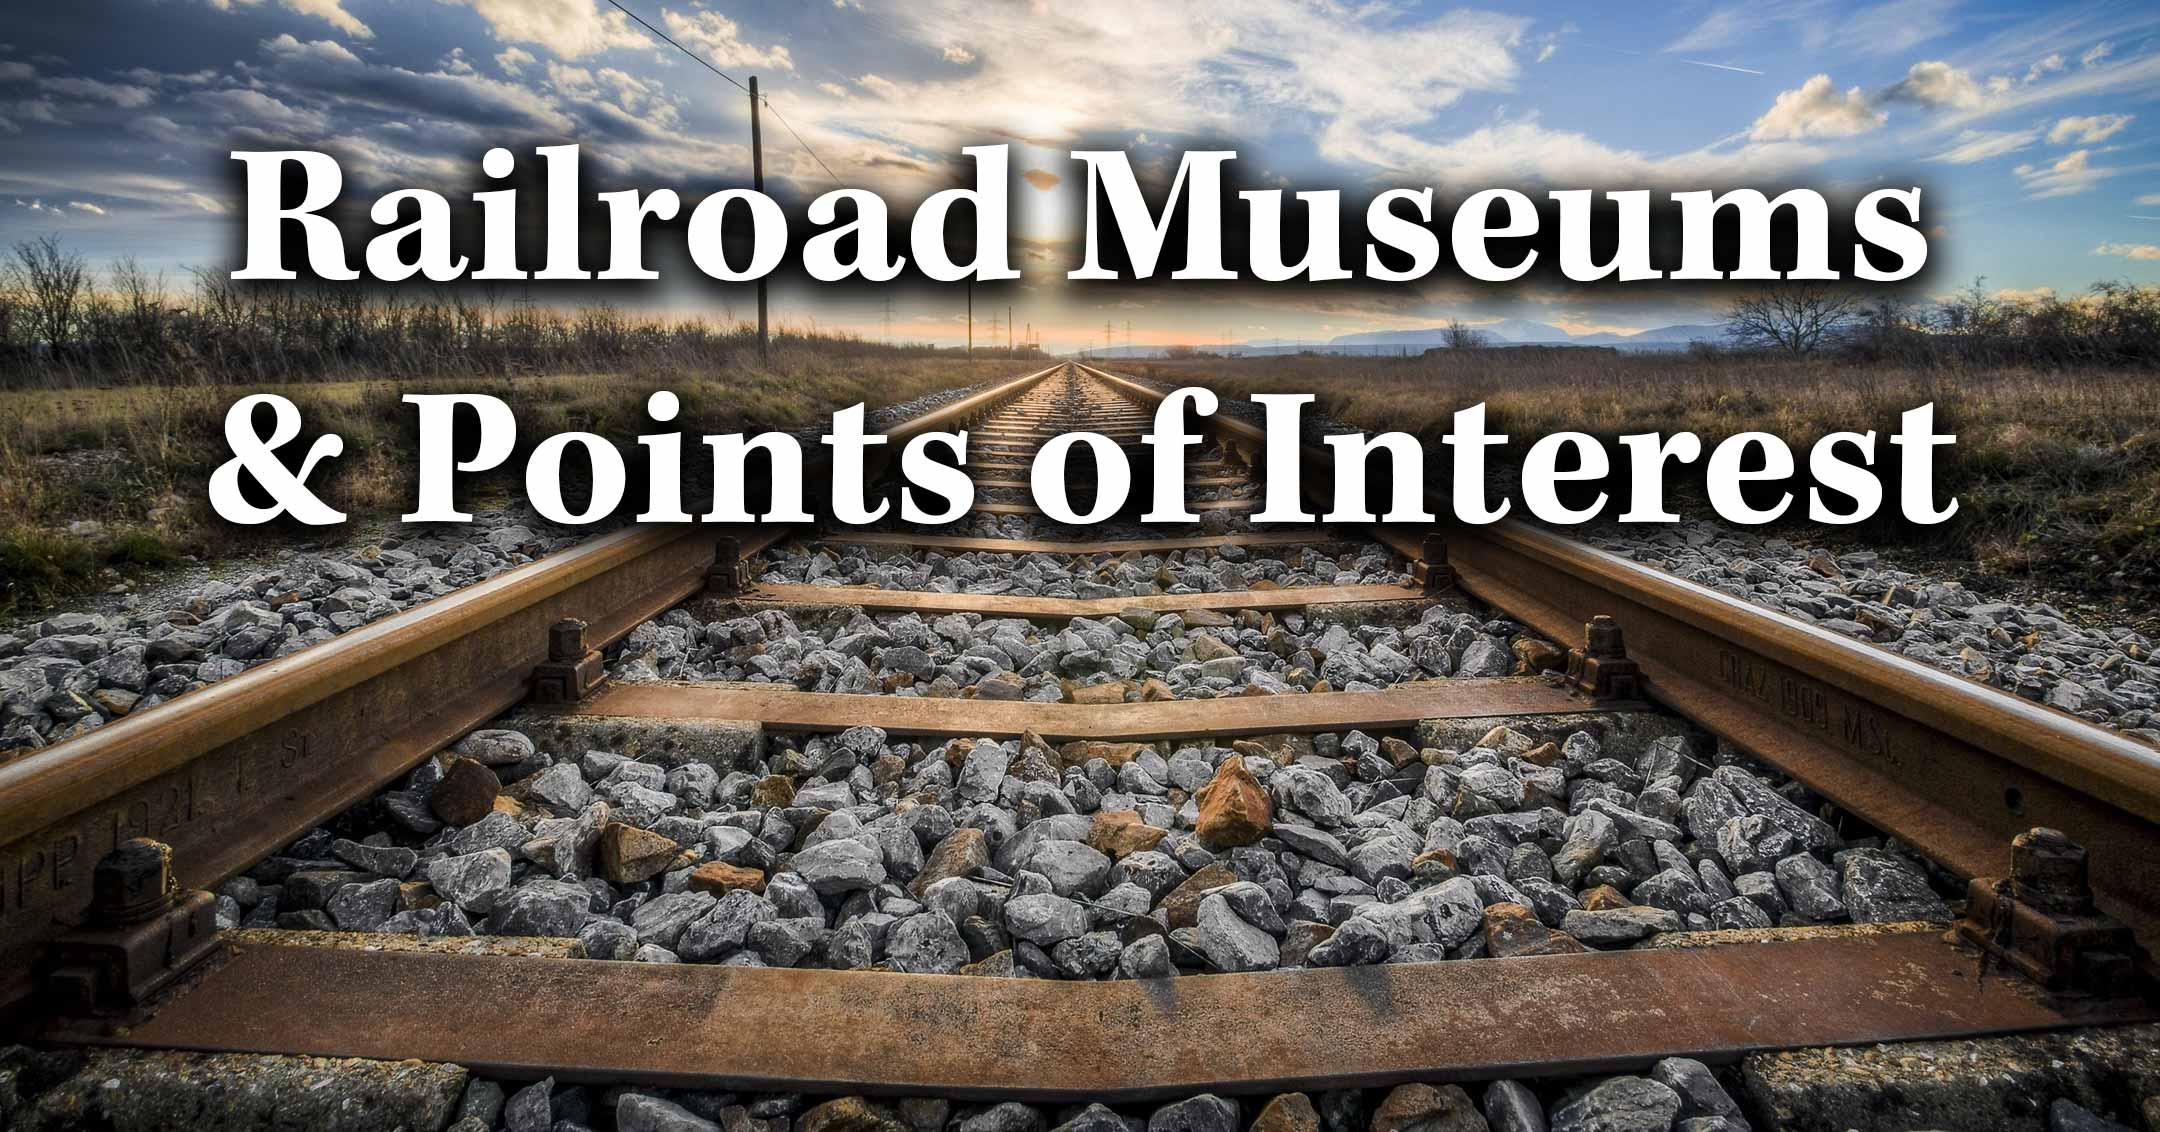 Railroad Museums & Points of Interest | RailroadFans.com